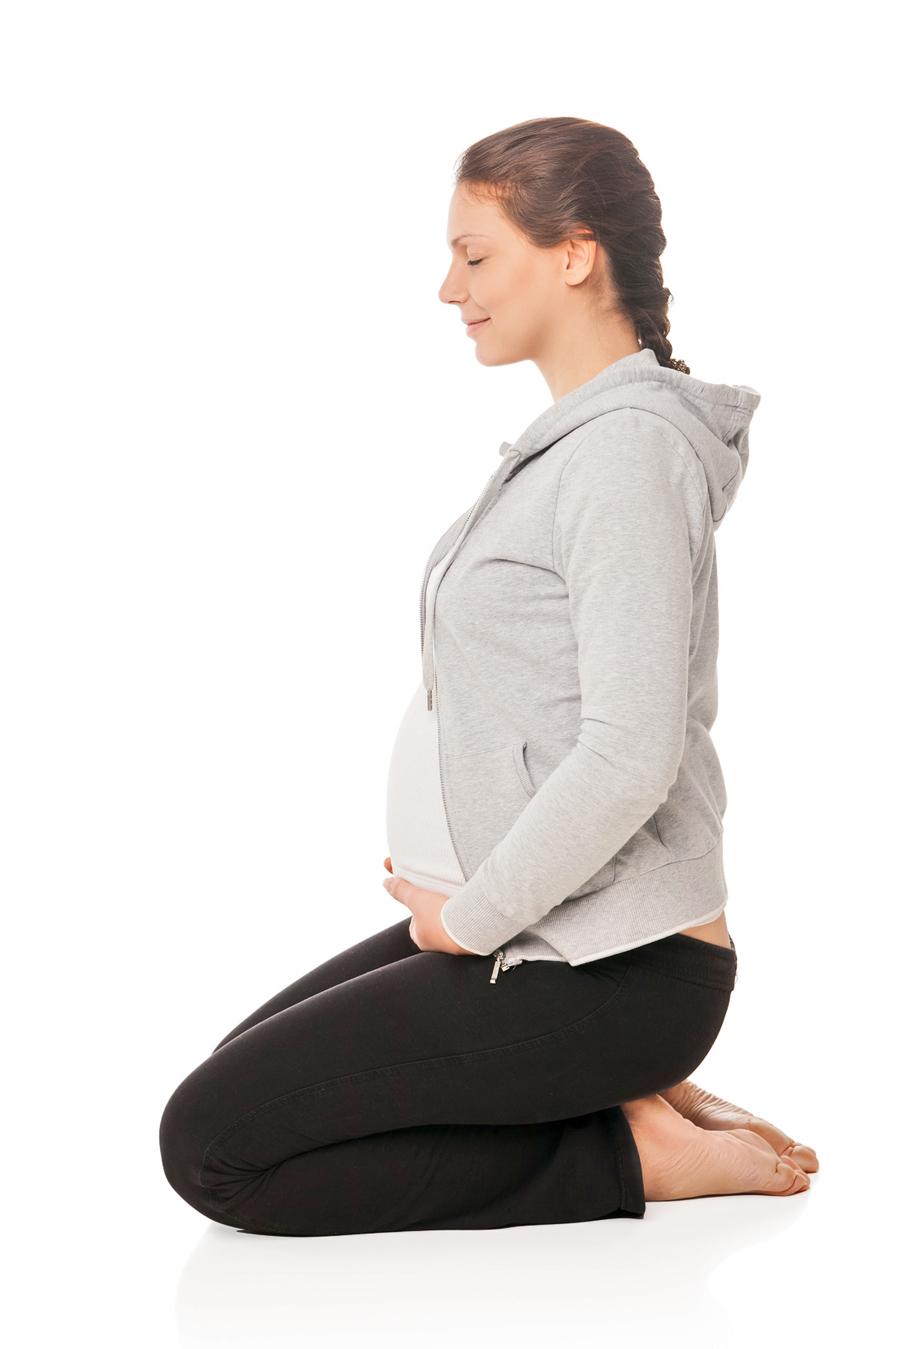 fisioginnastica-in-gravidanza